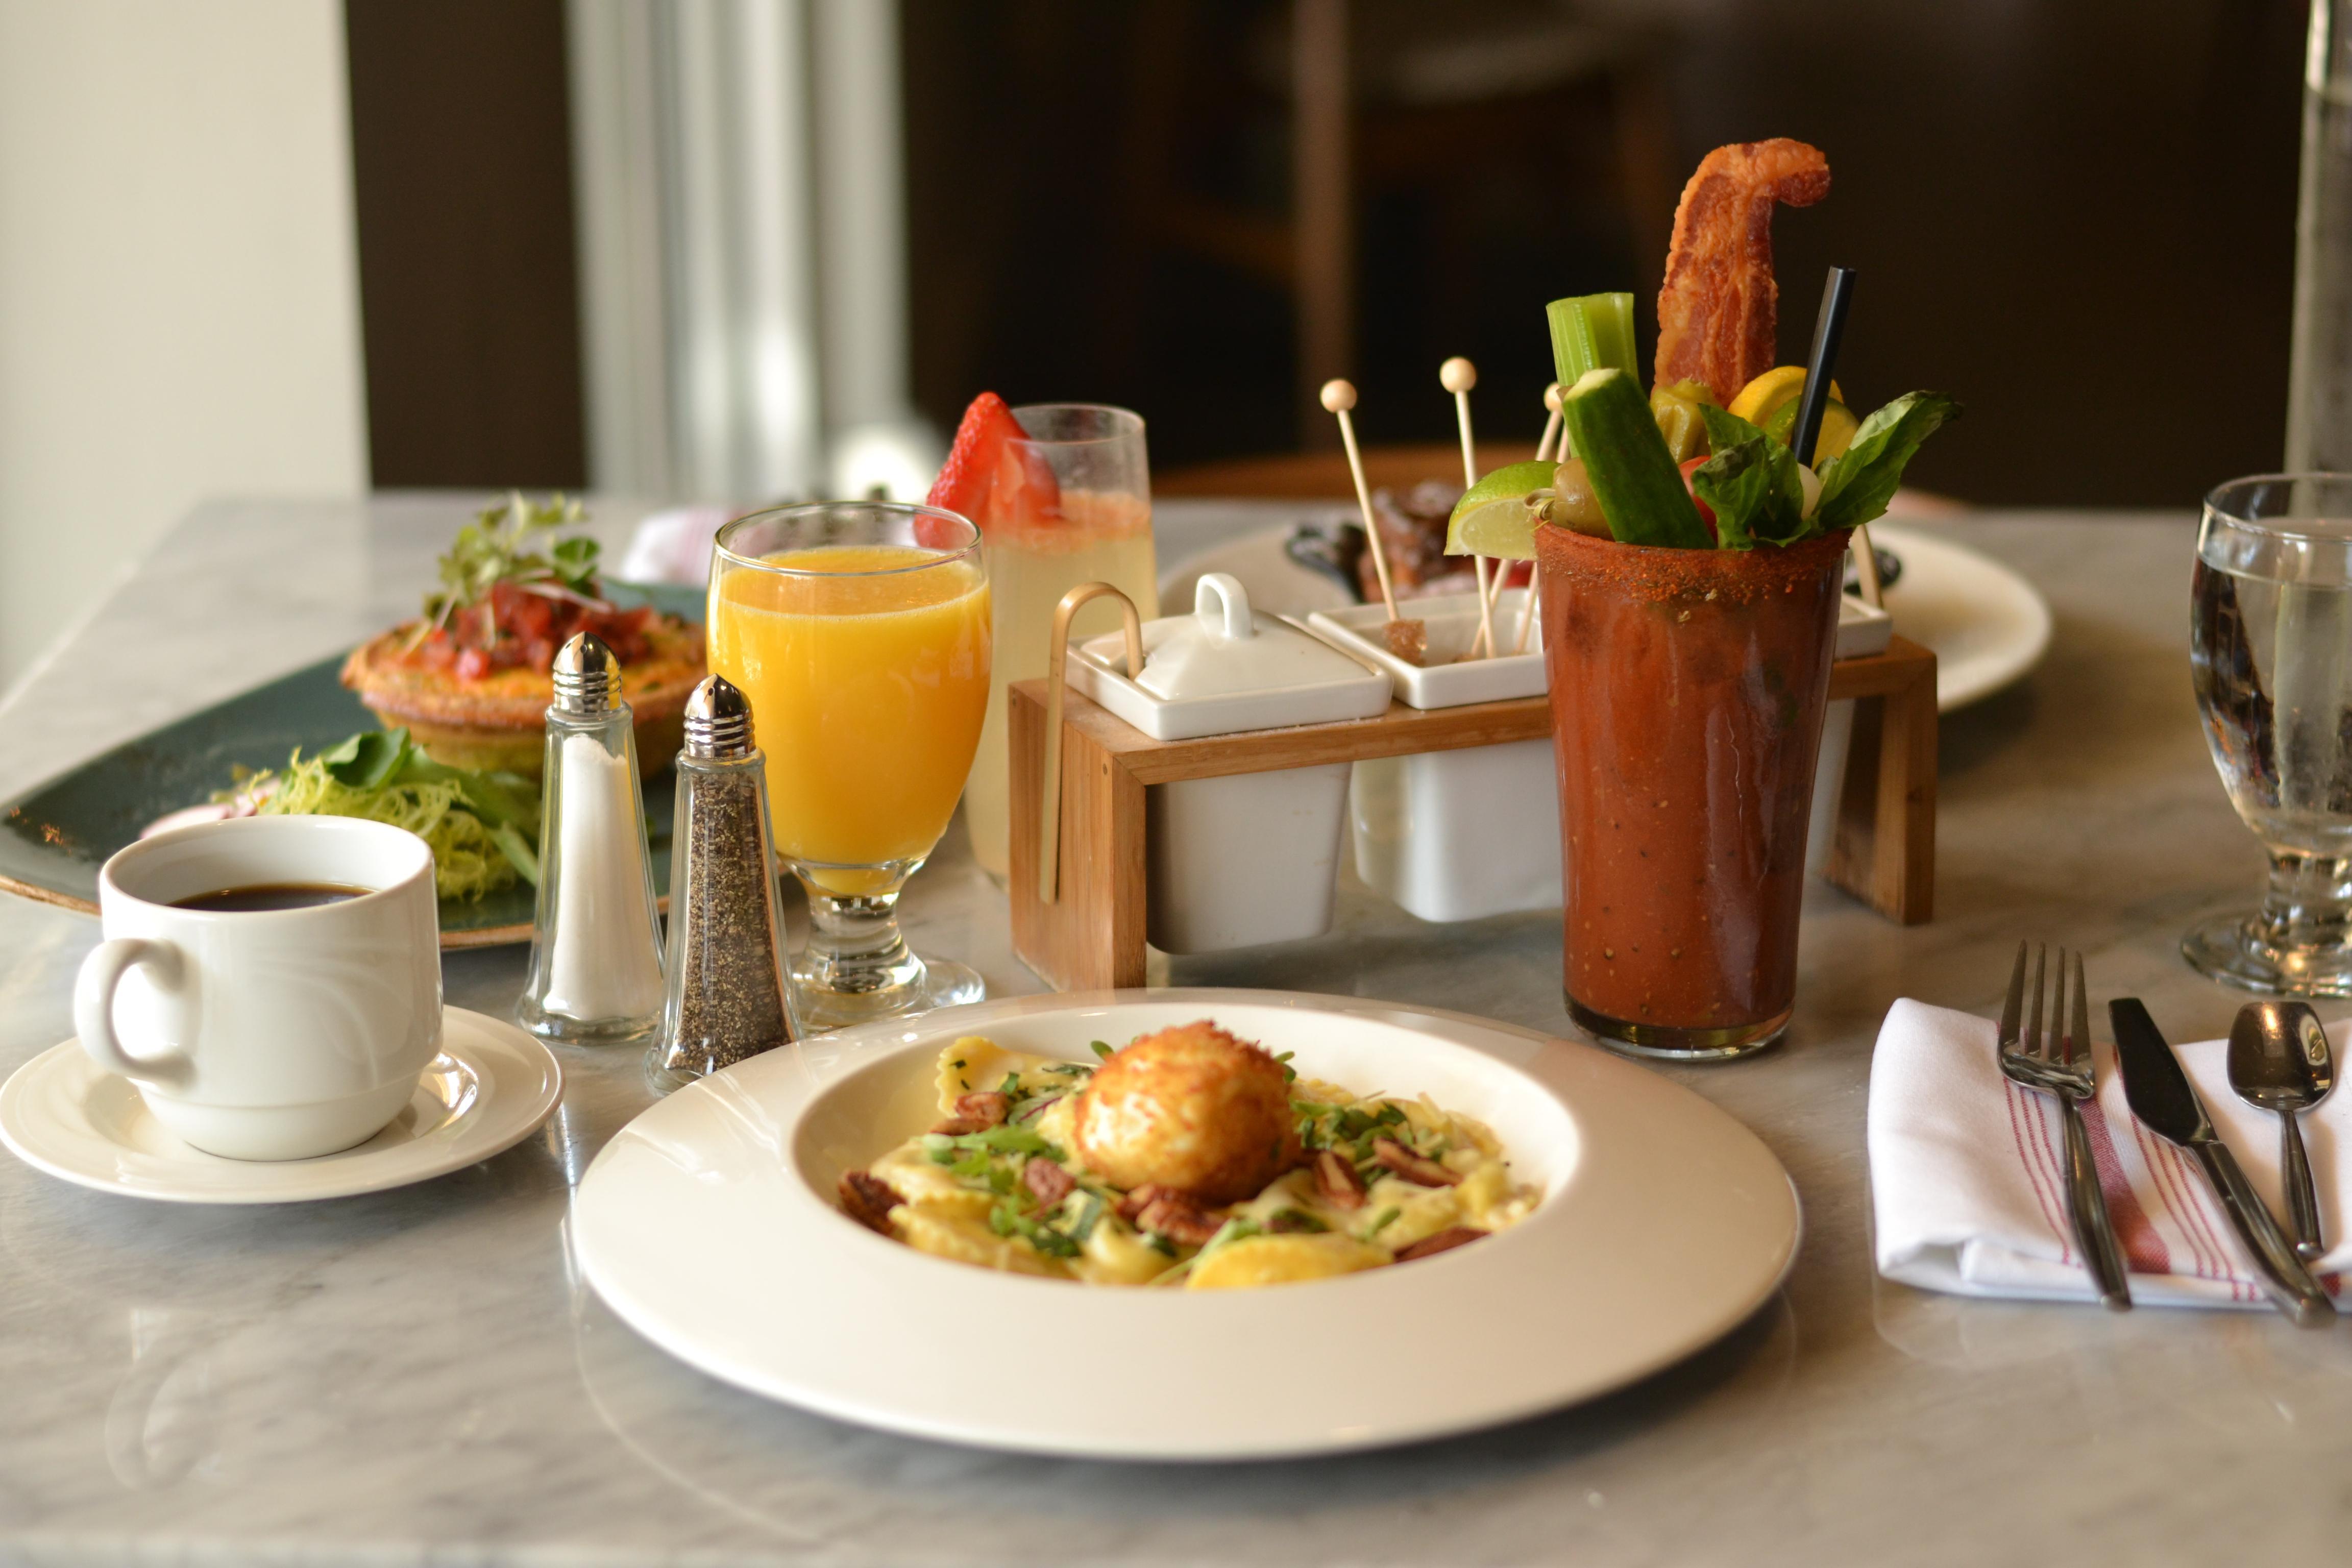 Brunch at Verge Restaurant + Lounge